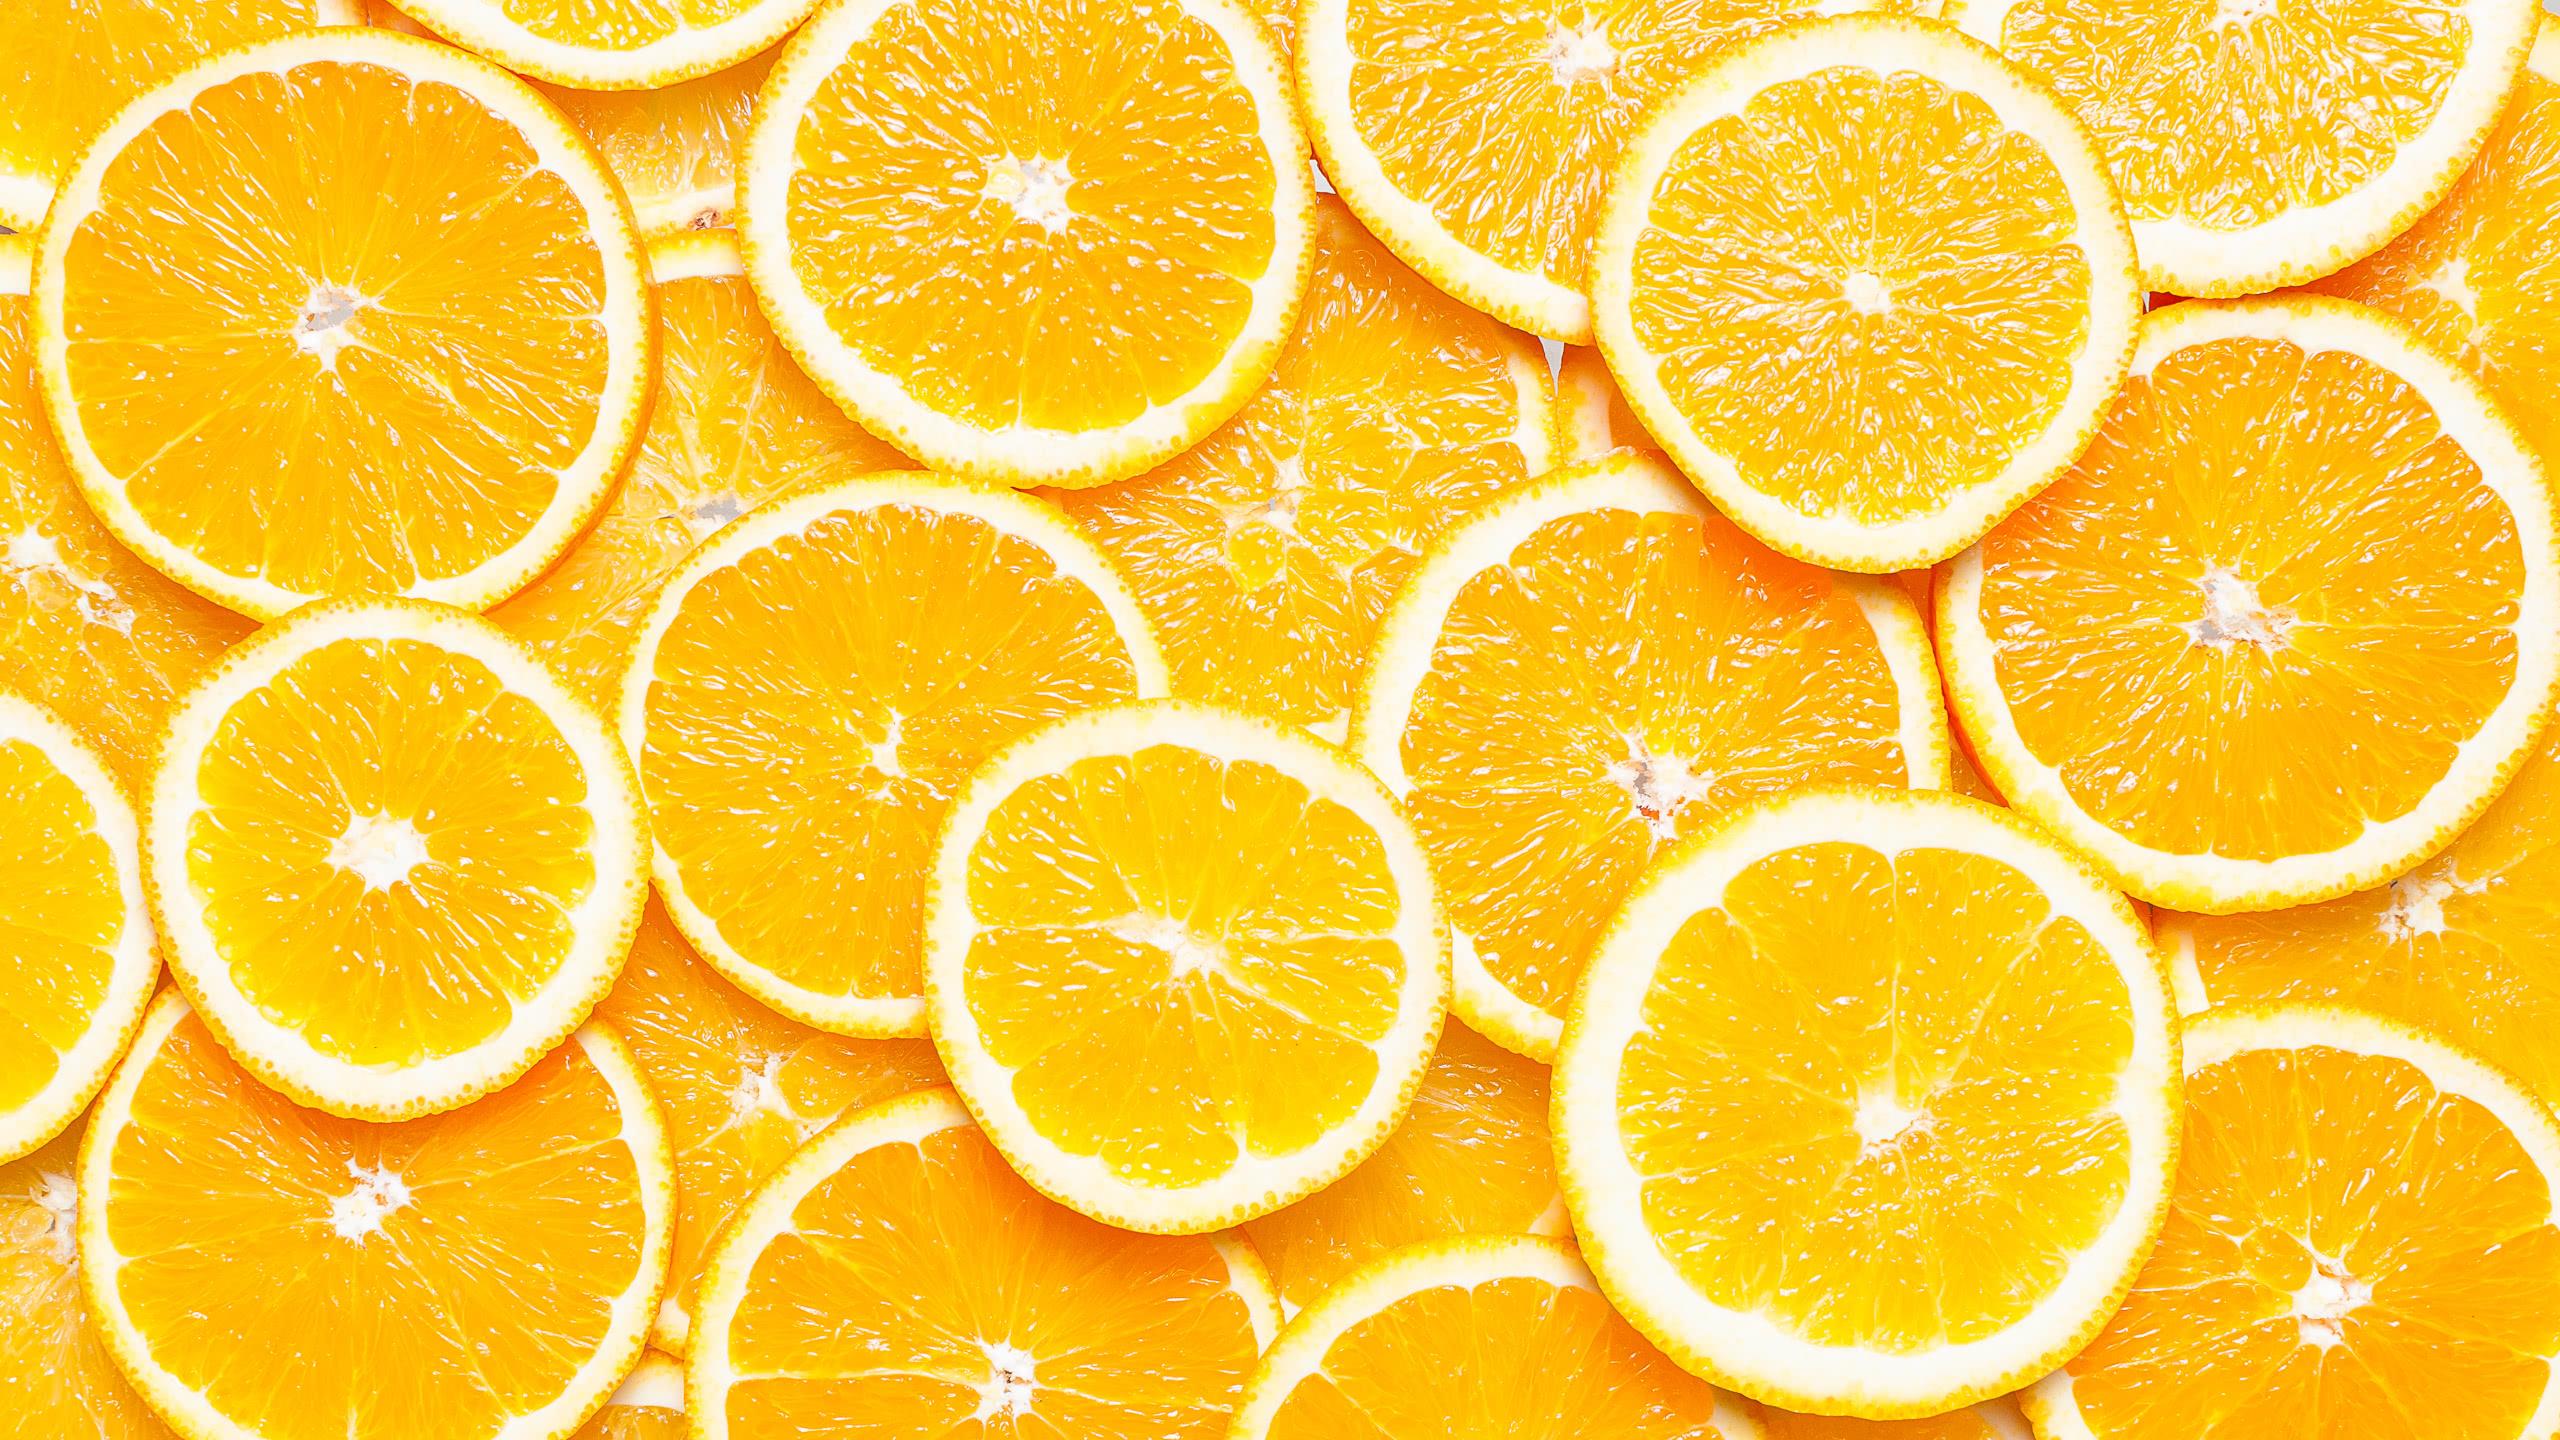 orange slices wqhd 1440p wallpaper